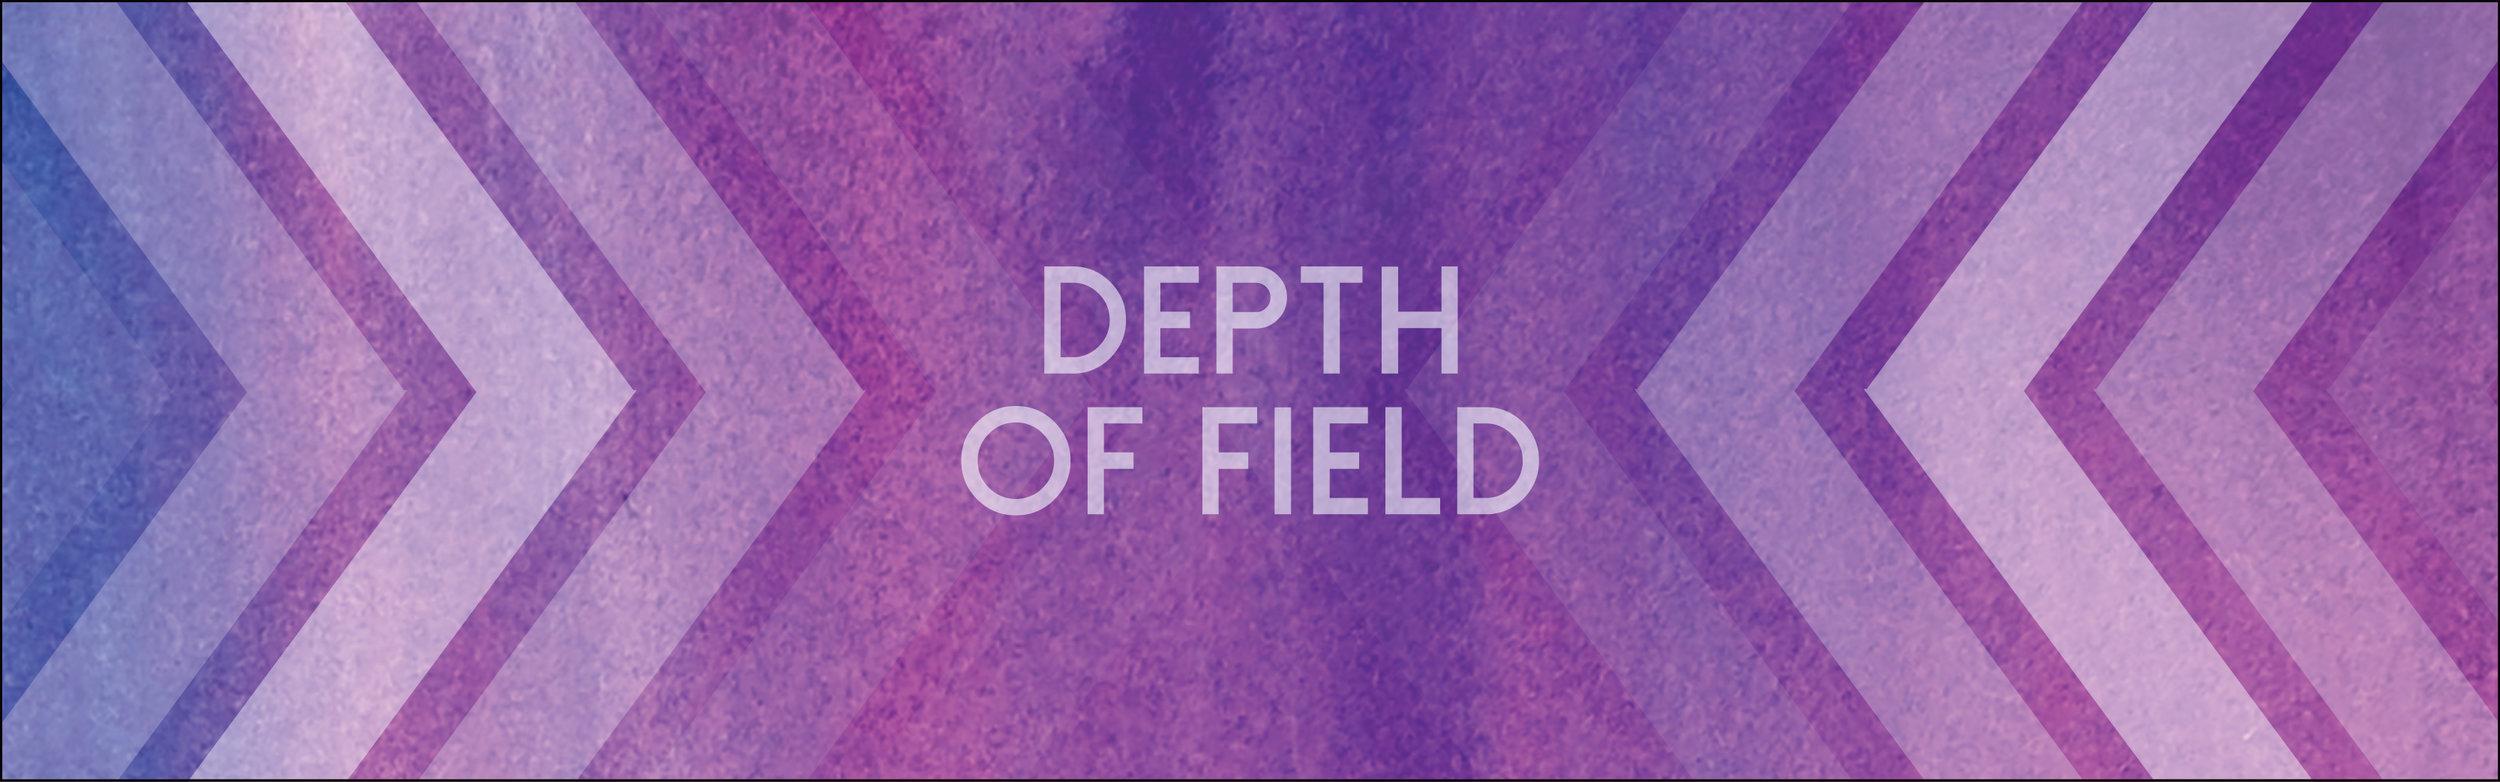 Transistor_Banner_DepthOfField.jpg